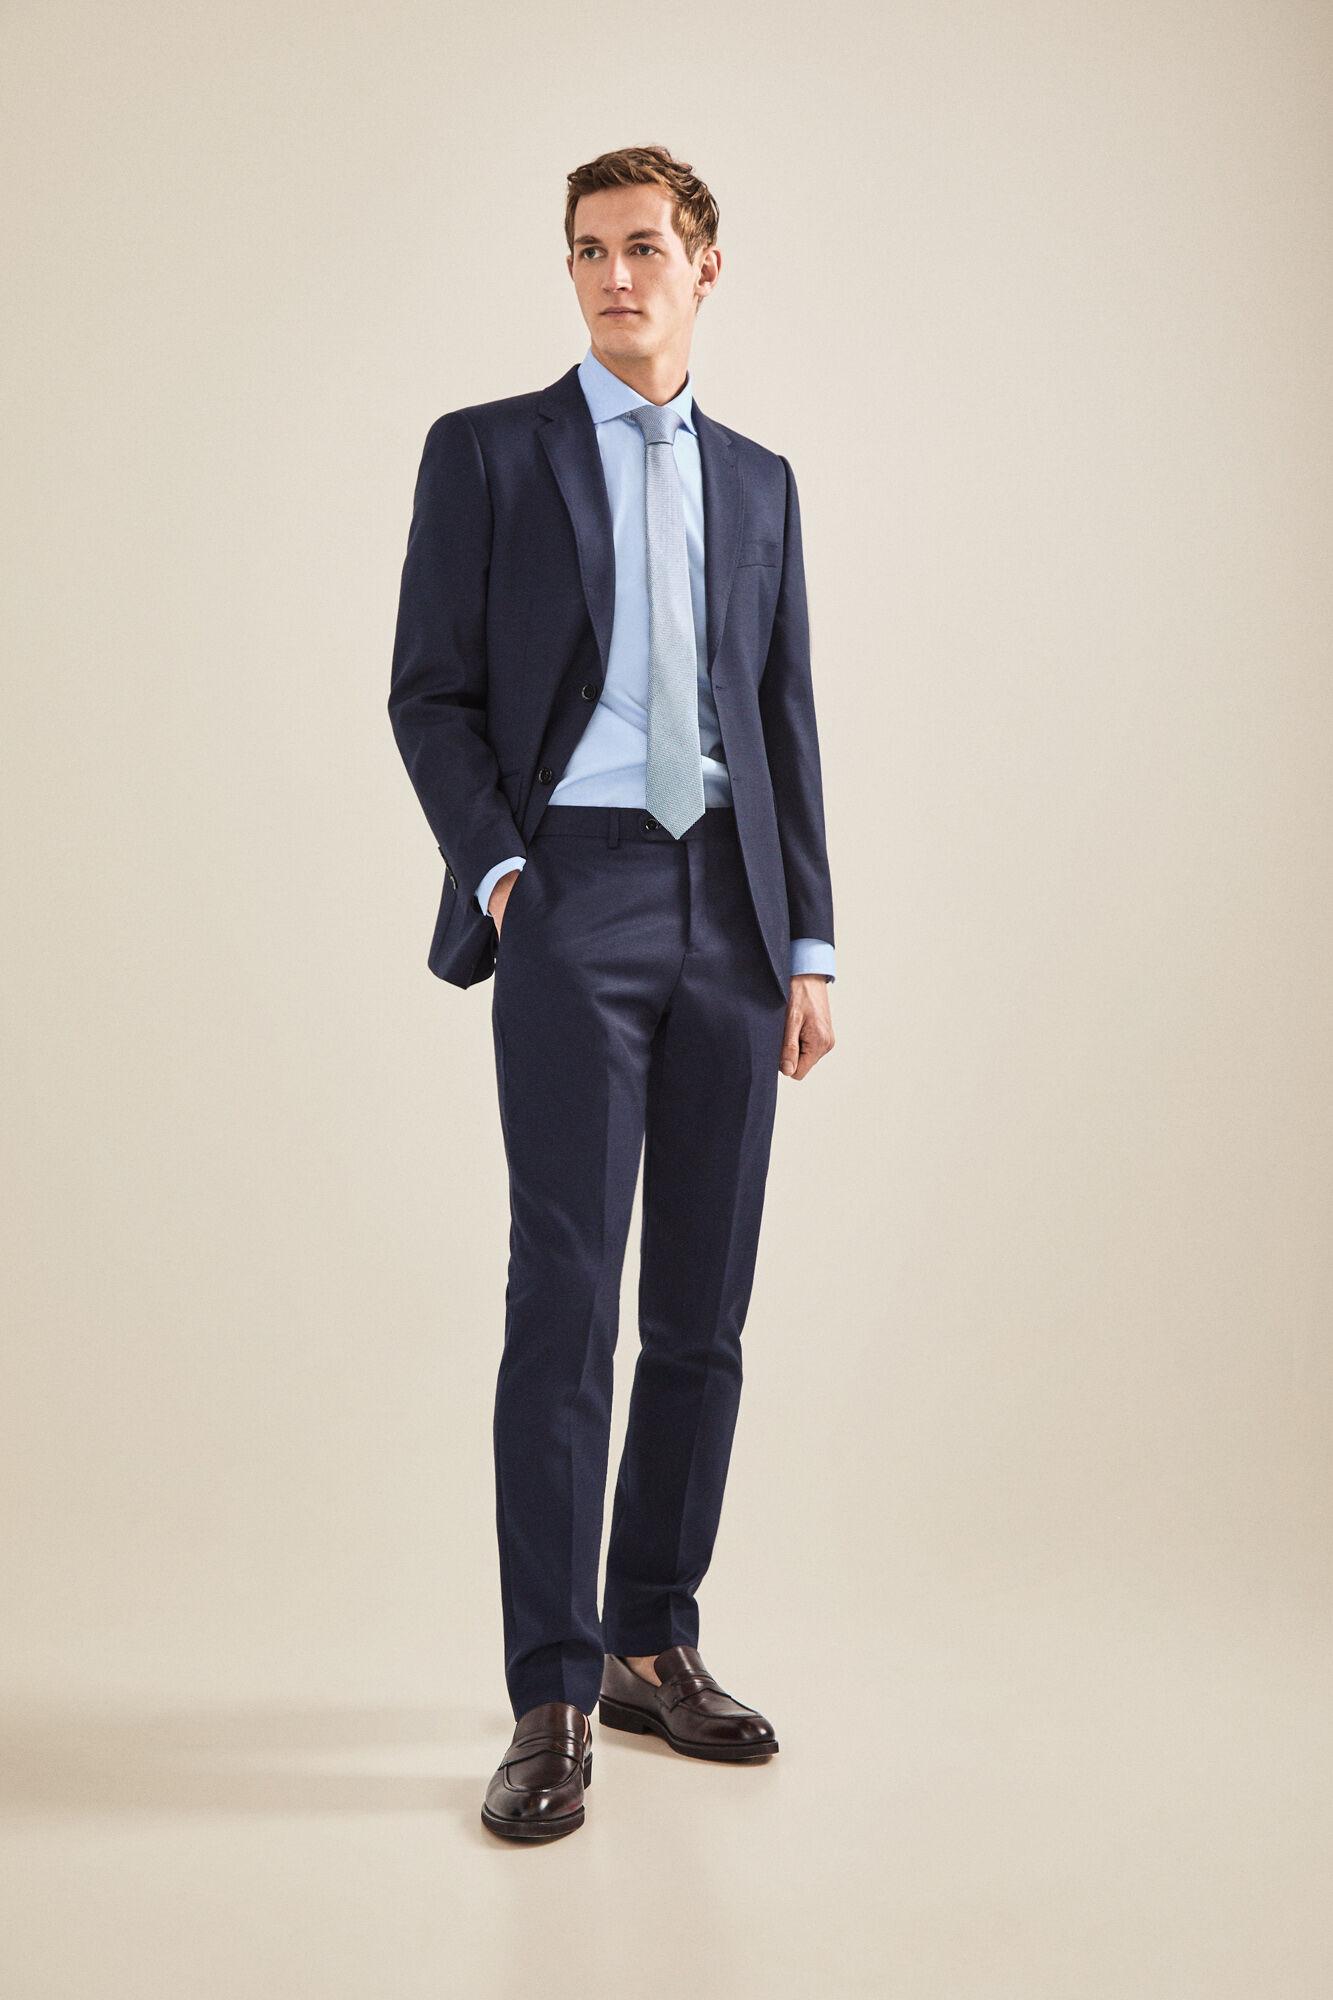 Pantalón traje marino slim fit. Cortefiel. Cortefiel. Cortefiel. Cortefiel.  Cortefiel. Cortefiel. 1 55f8d718b50